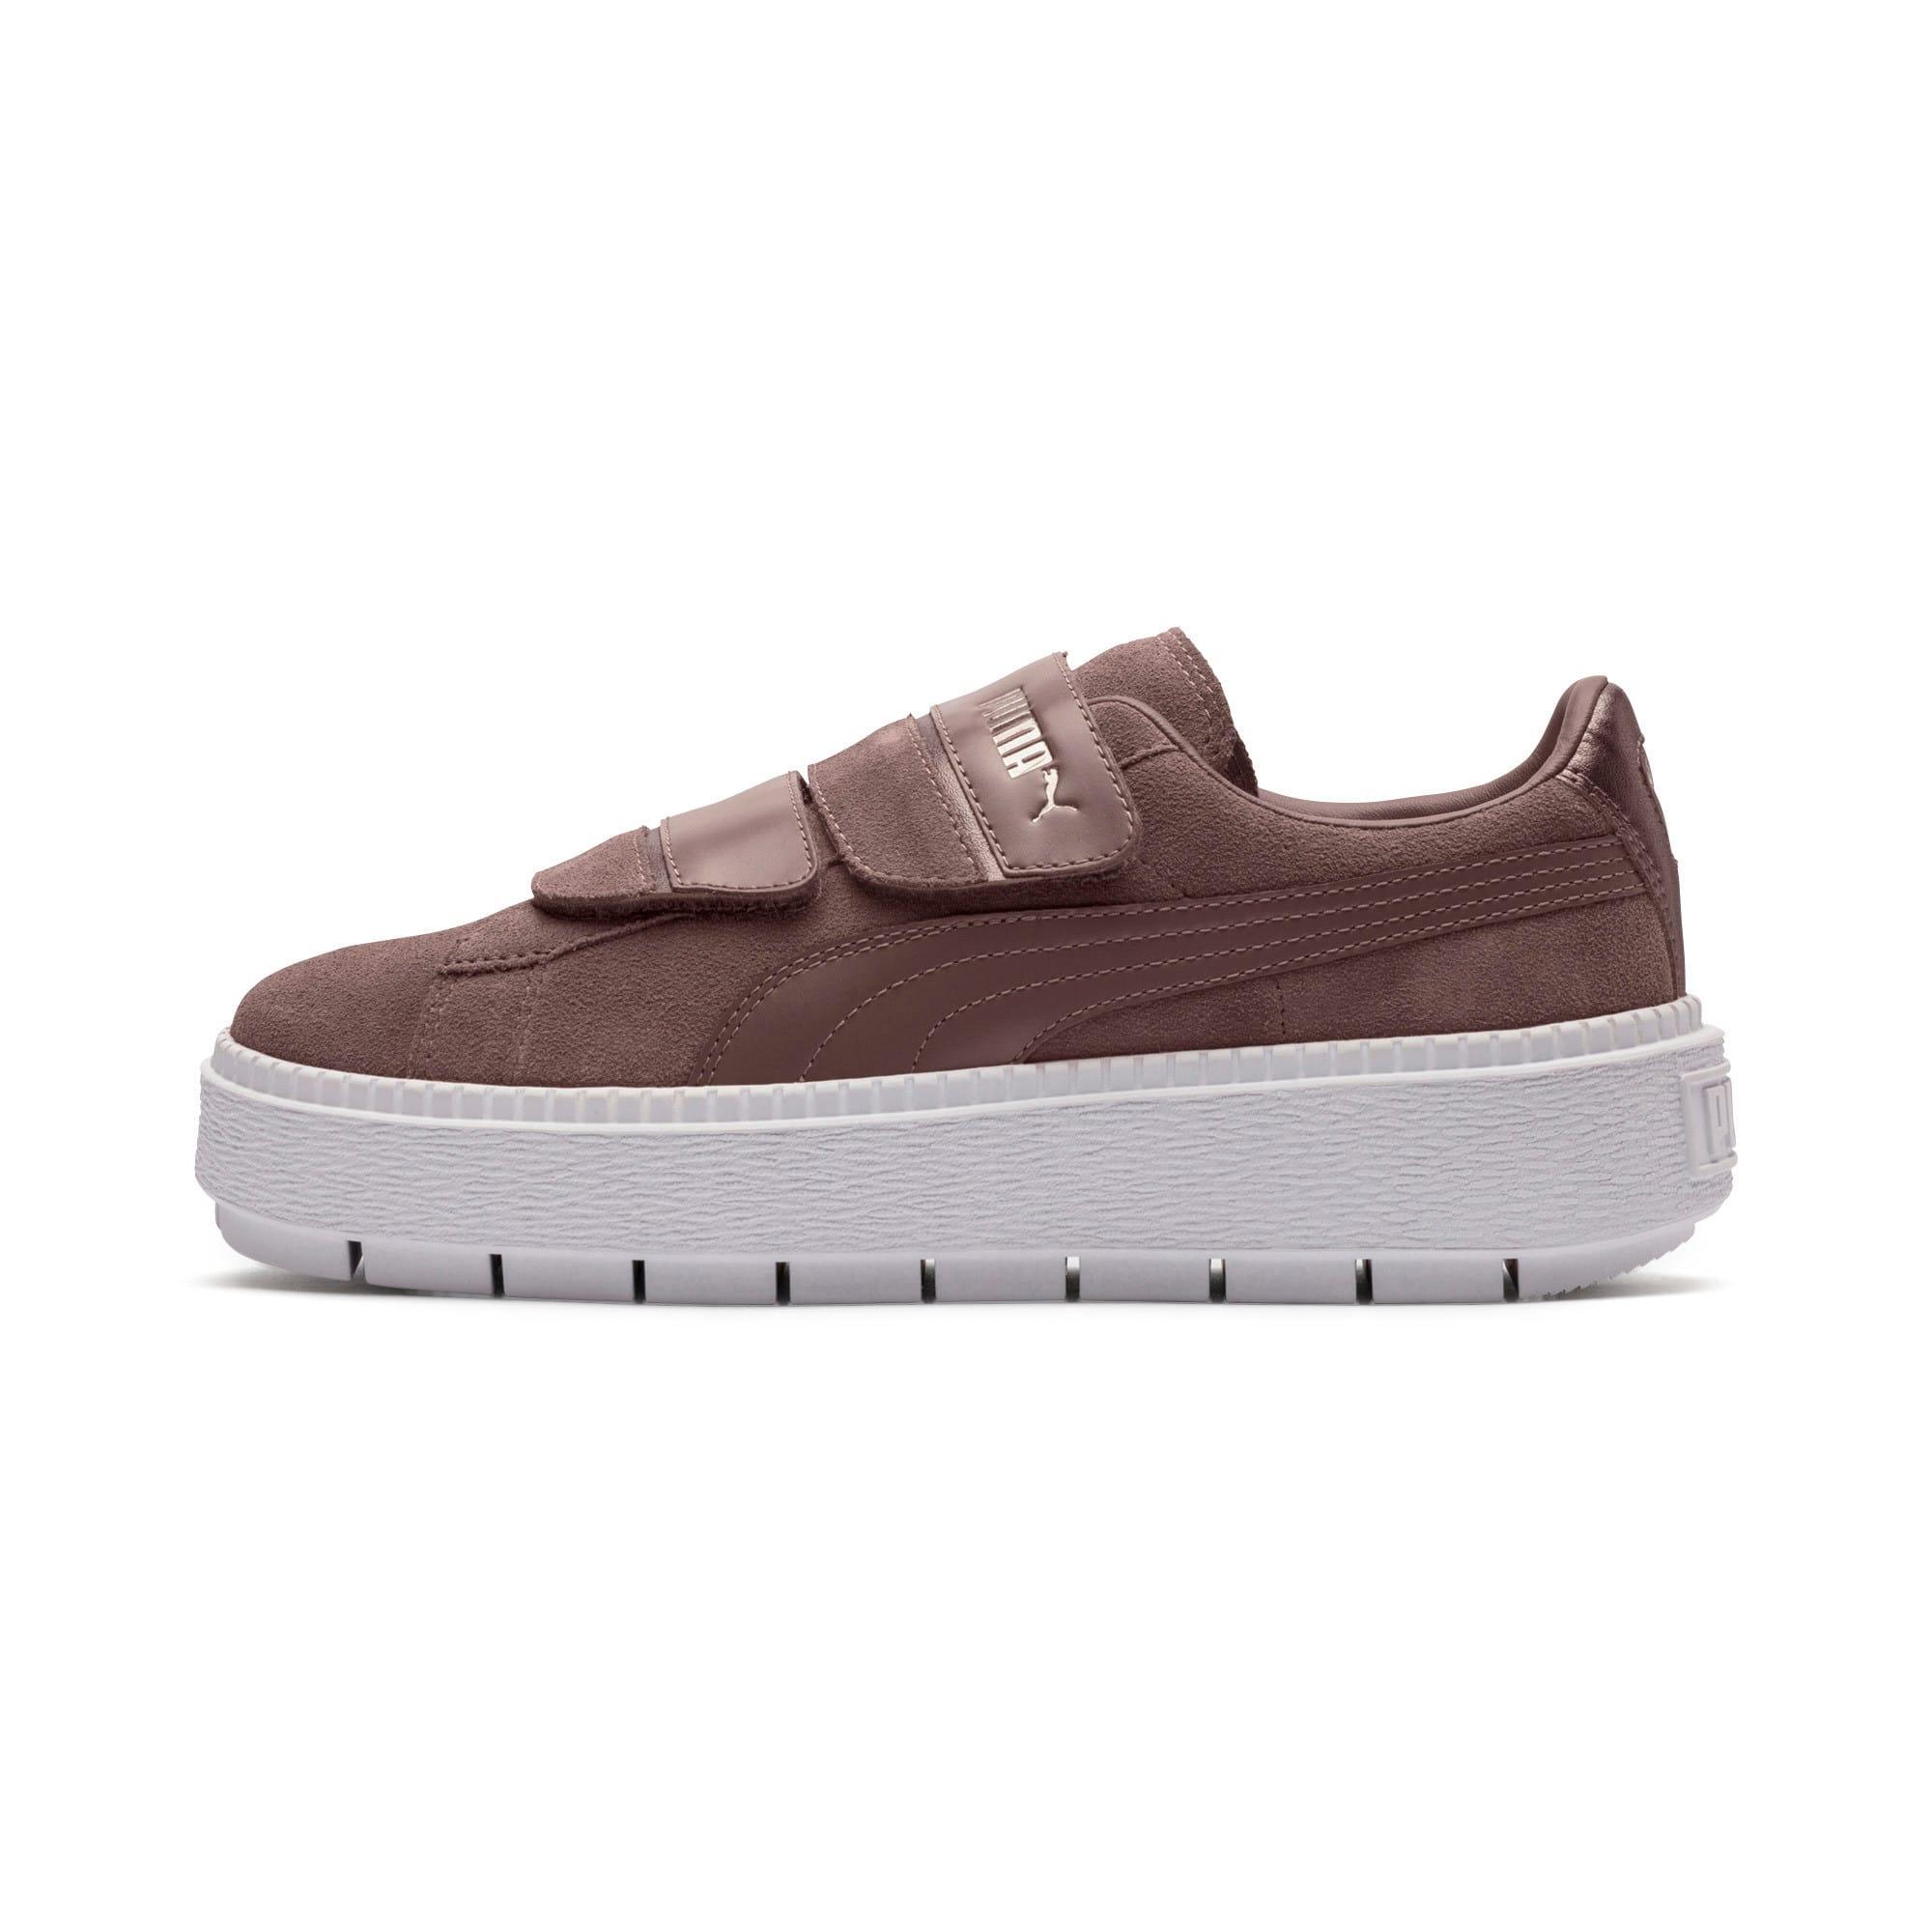 Thumbnail 1 of Platform Trace Strap Esc Women's Sneakers, Peppercorn-Peppercorn, medium